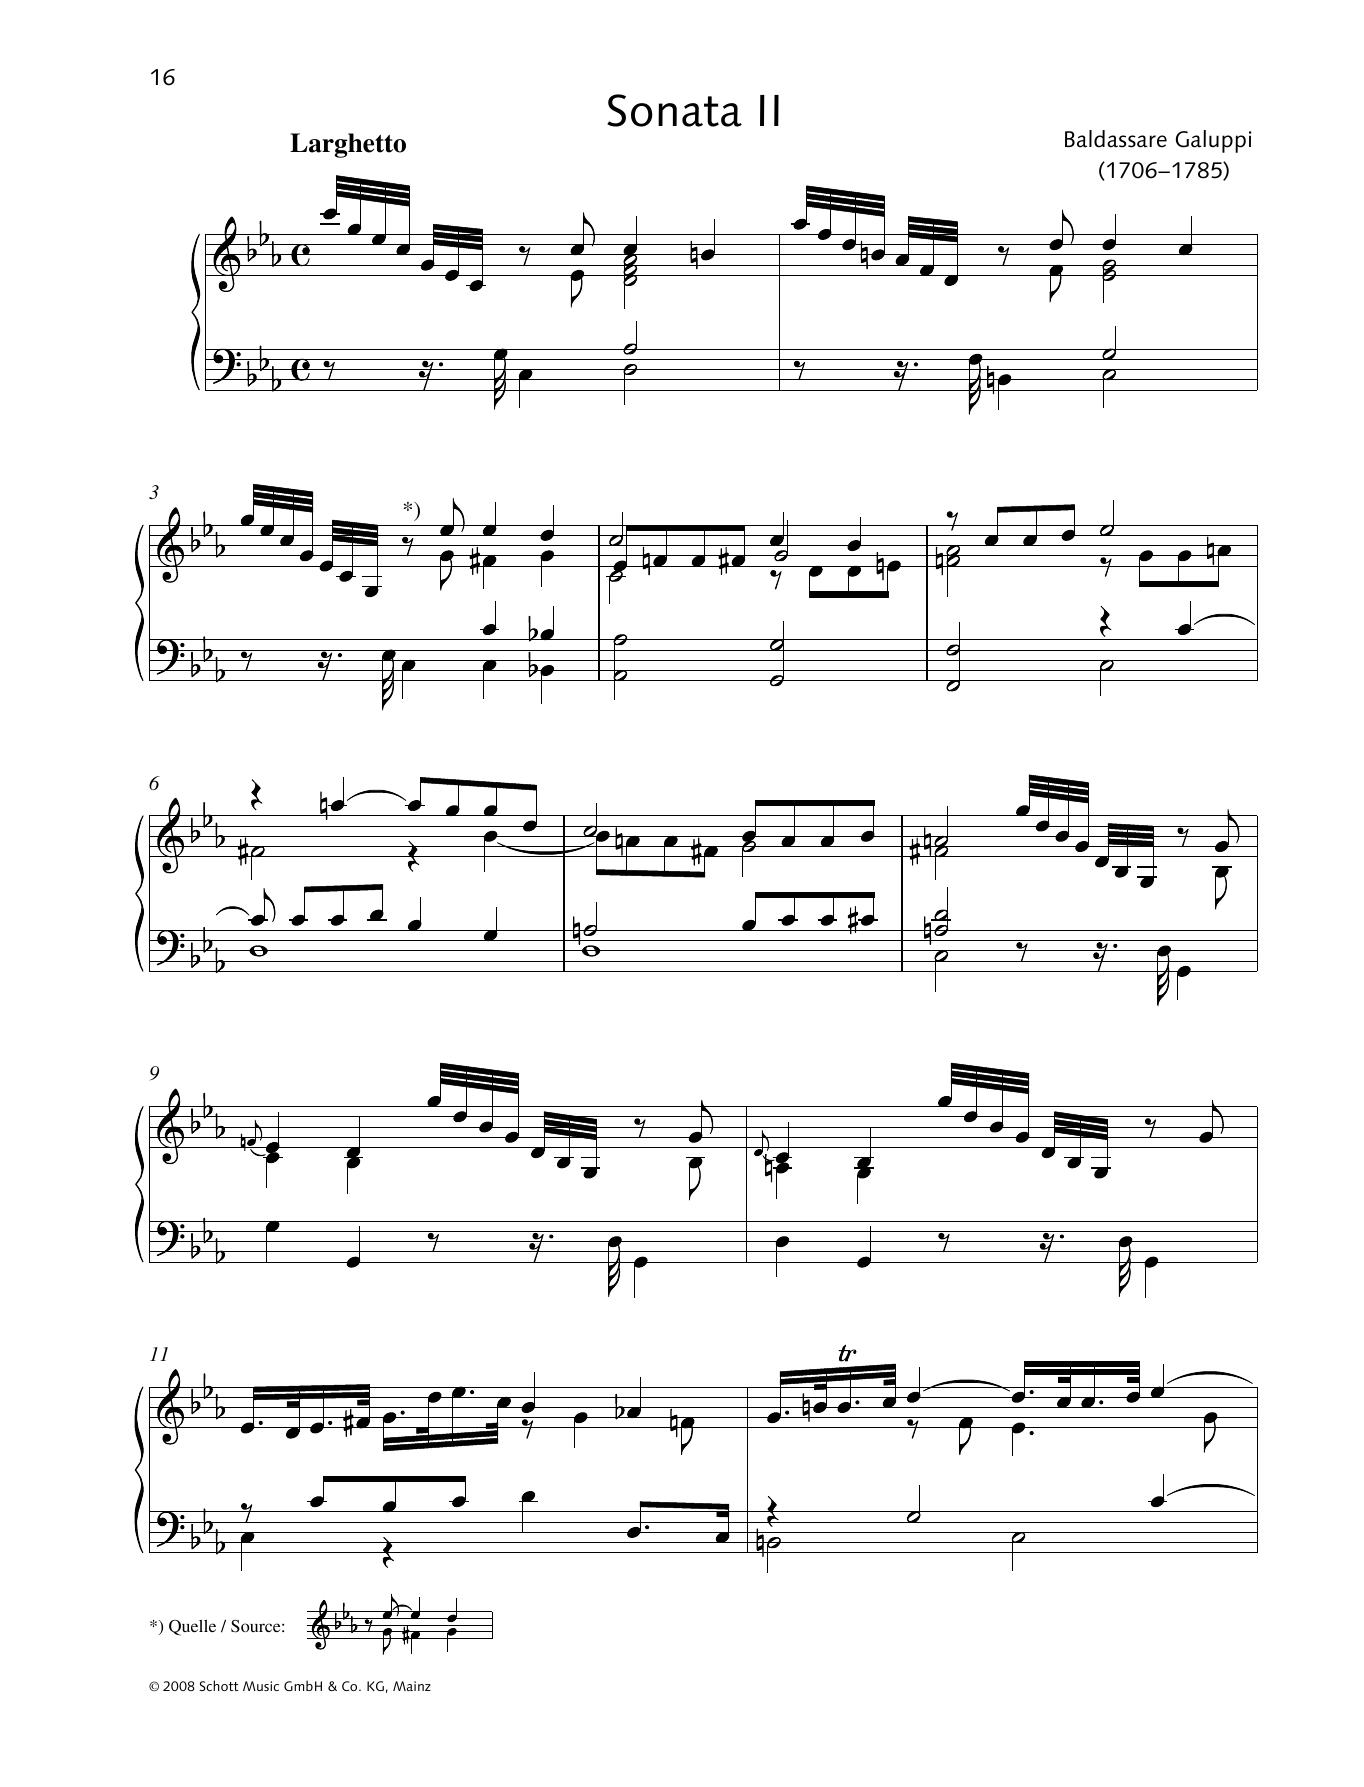 Baldassare Galuppi Sonata II C minor sheet music preview music notes and score for Piano Solo including 10 page(s)